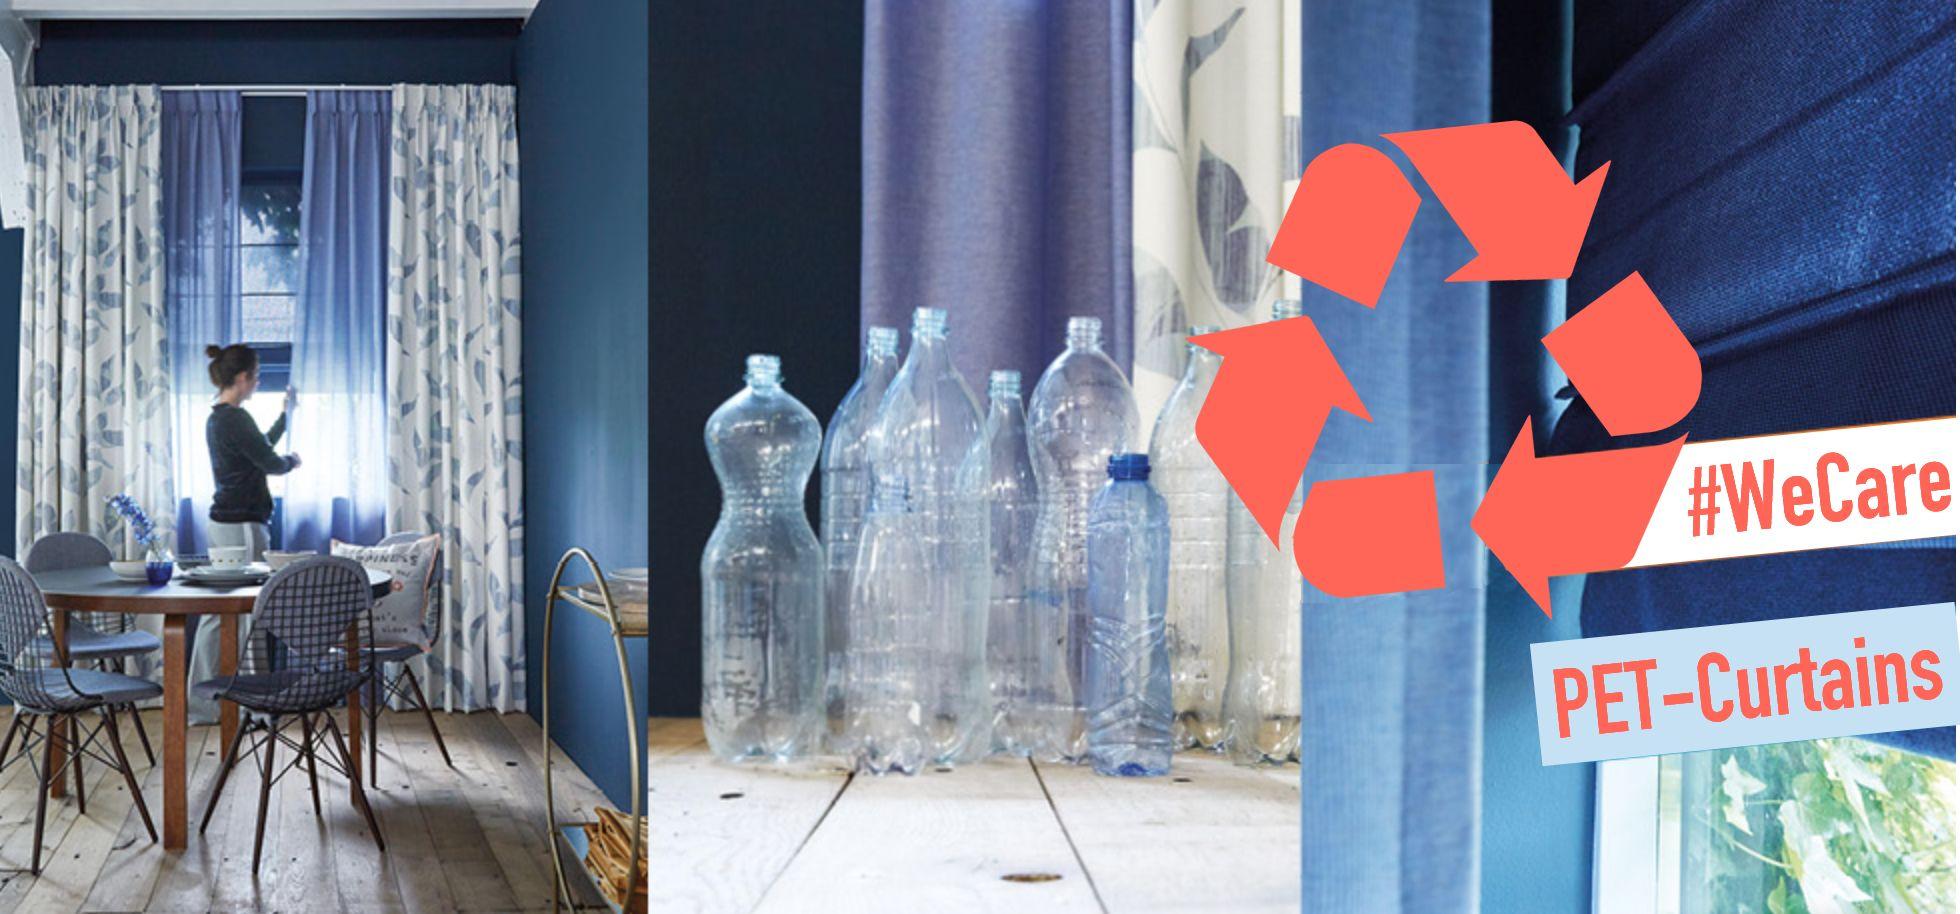 https://cdn.webshopapp.com/shops/219758/files/209013335/recycle-curtains-gordijnen-dotshop.jpg